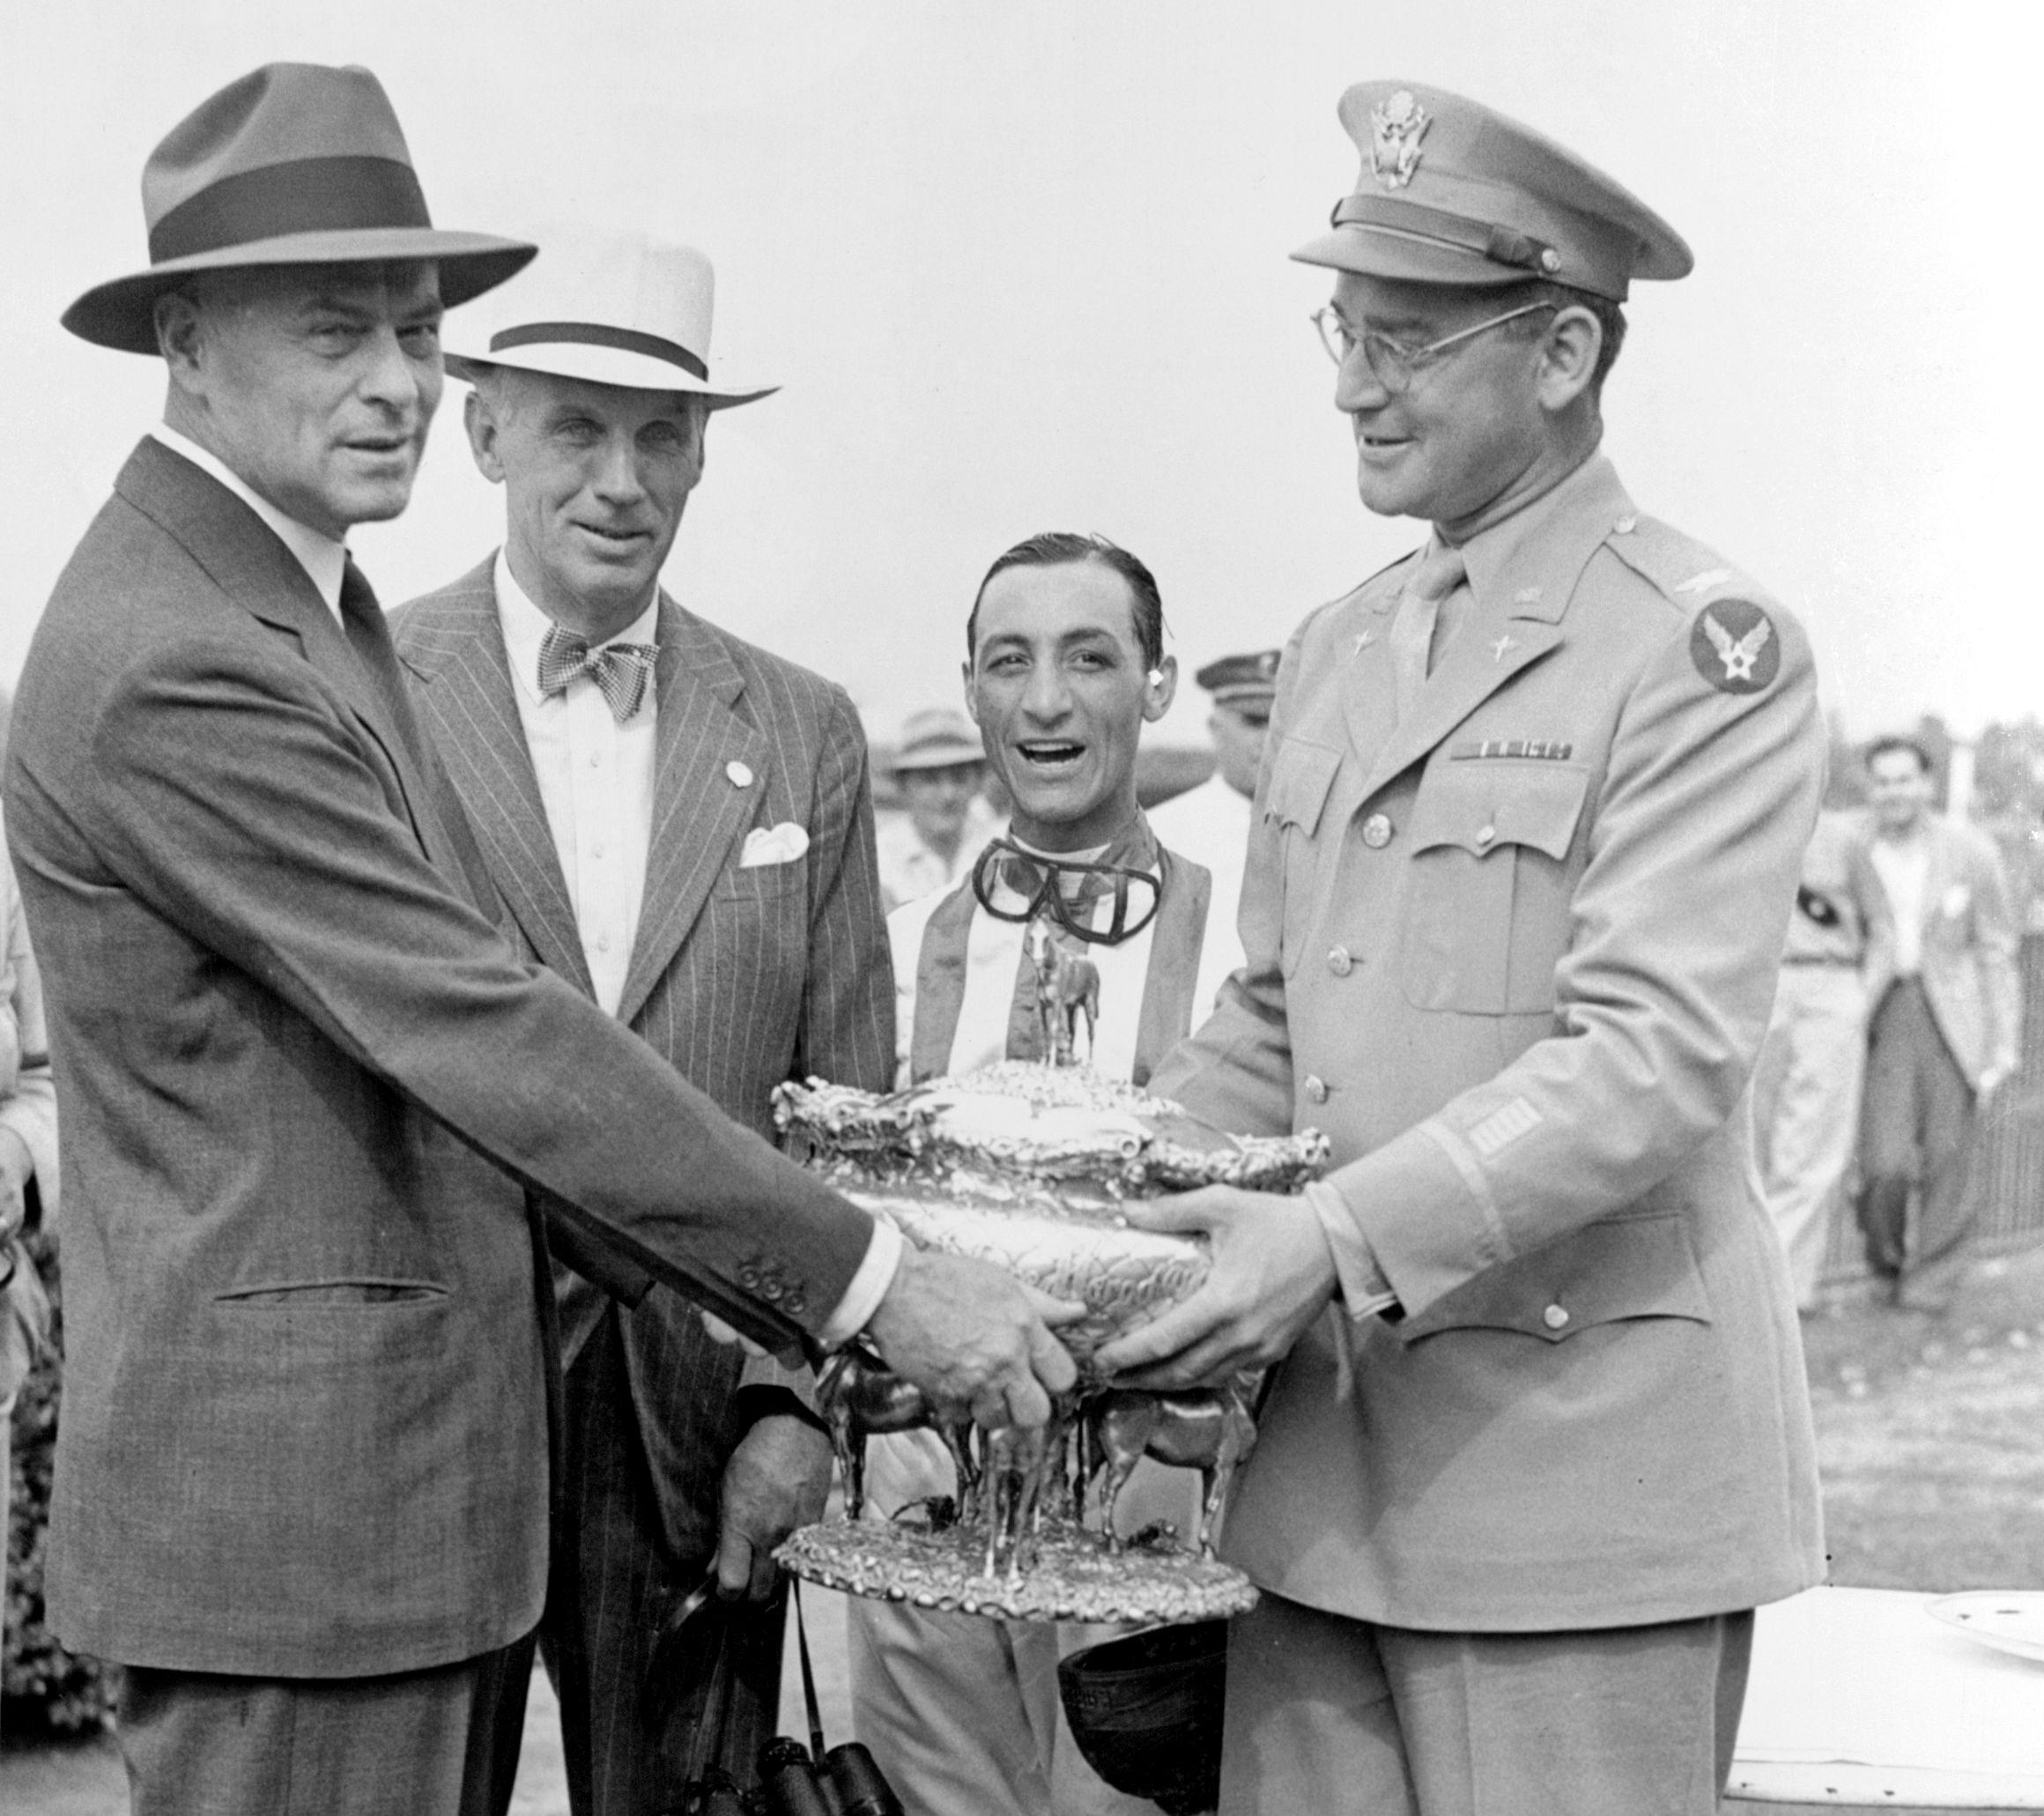 Keeneland Library Morgan Collection - Walter Jeffords, George D Widener Jr, E. Arcaro & John Hay Whitney at 1942 Belmont.jpg